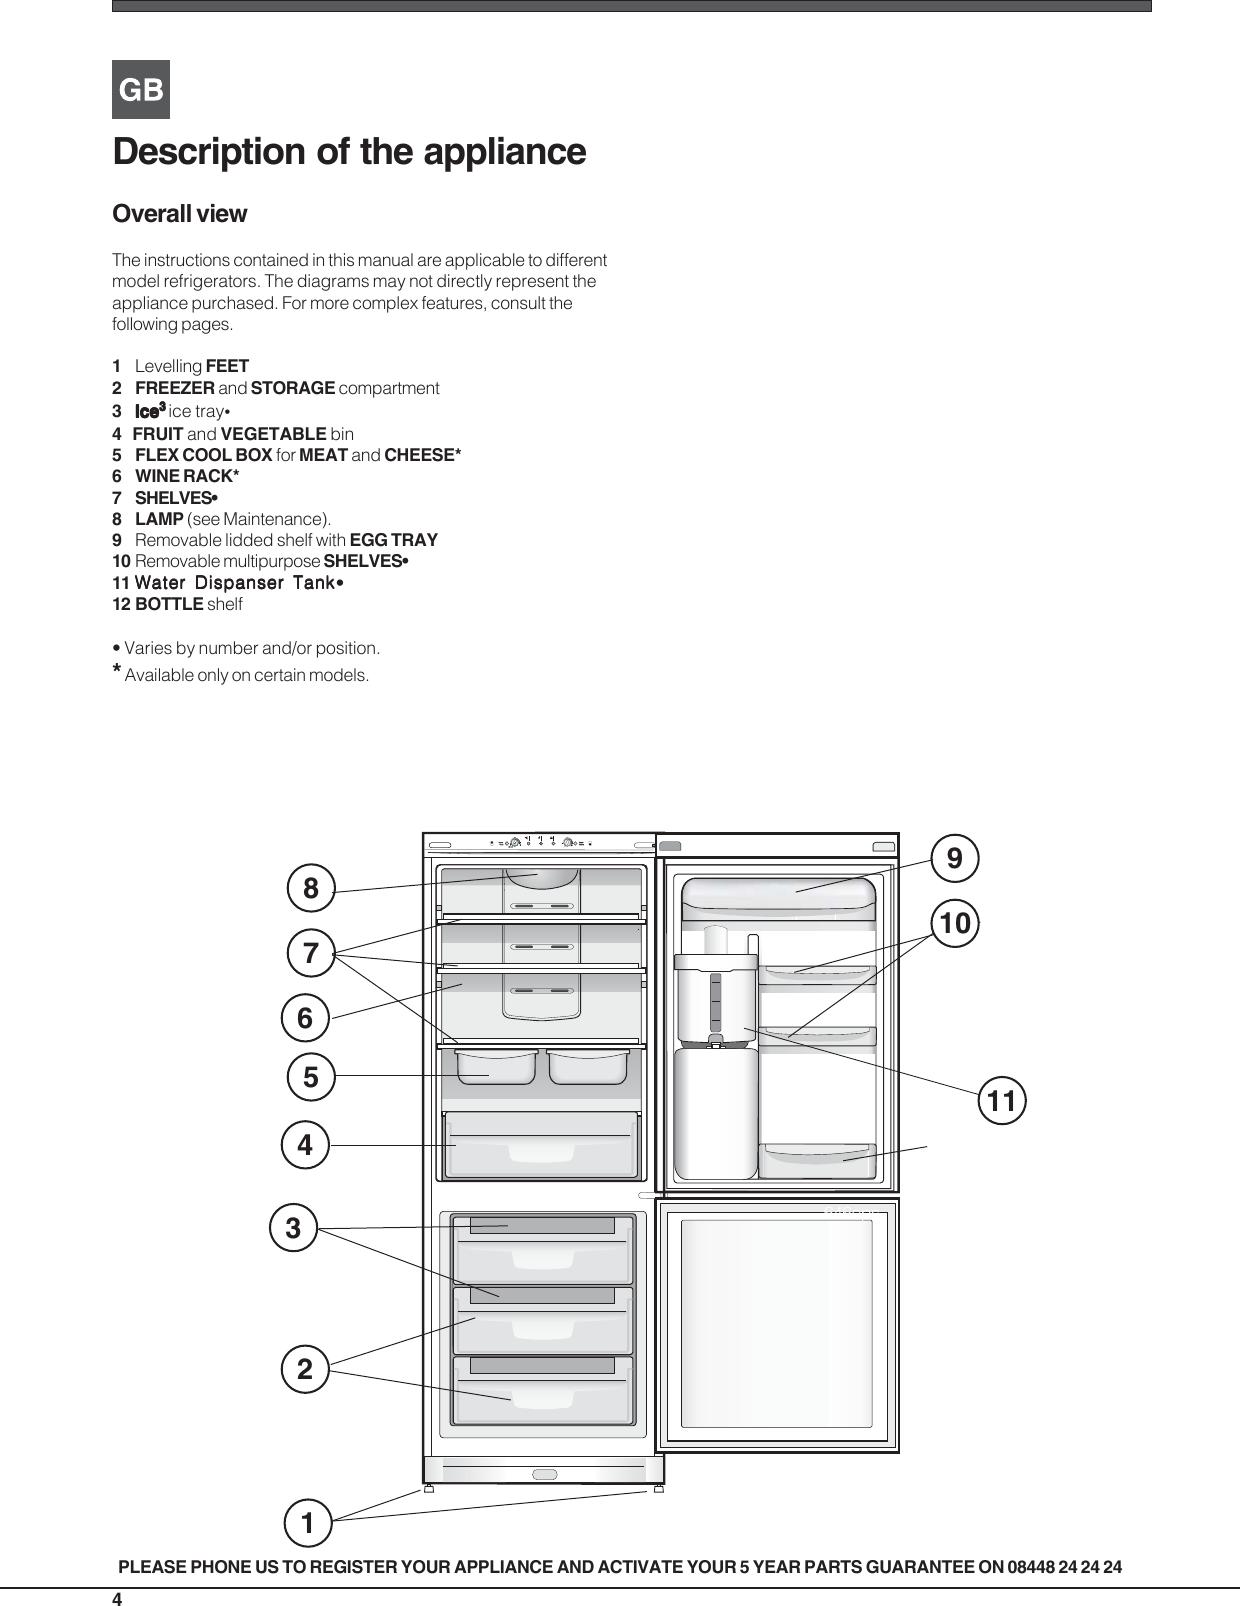 Indesit refrigerator ban 40 users manual 19508693000gb tr page 4 of 12 indesit indesit refrigerator ban 40 users cheapraybanclubmaster Images